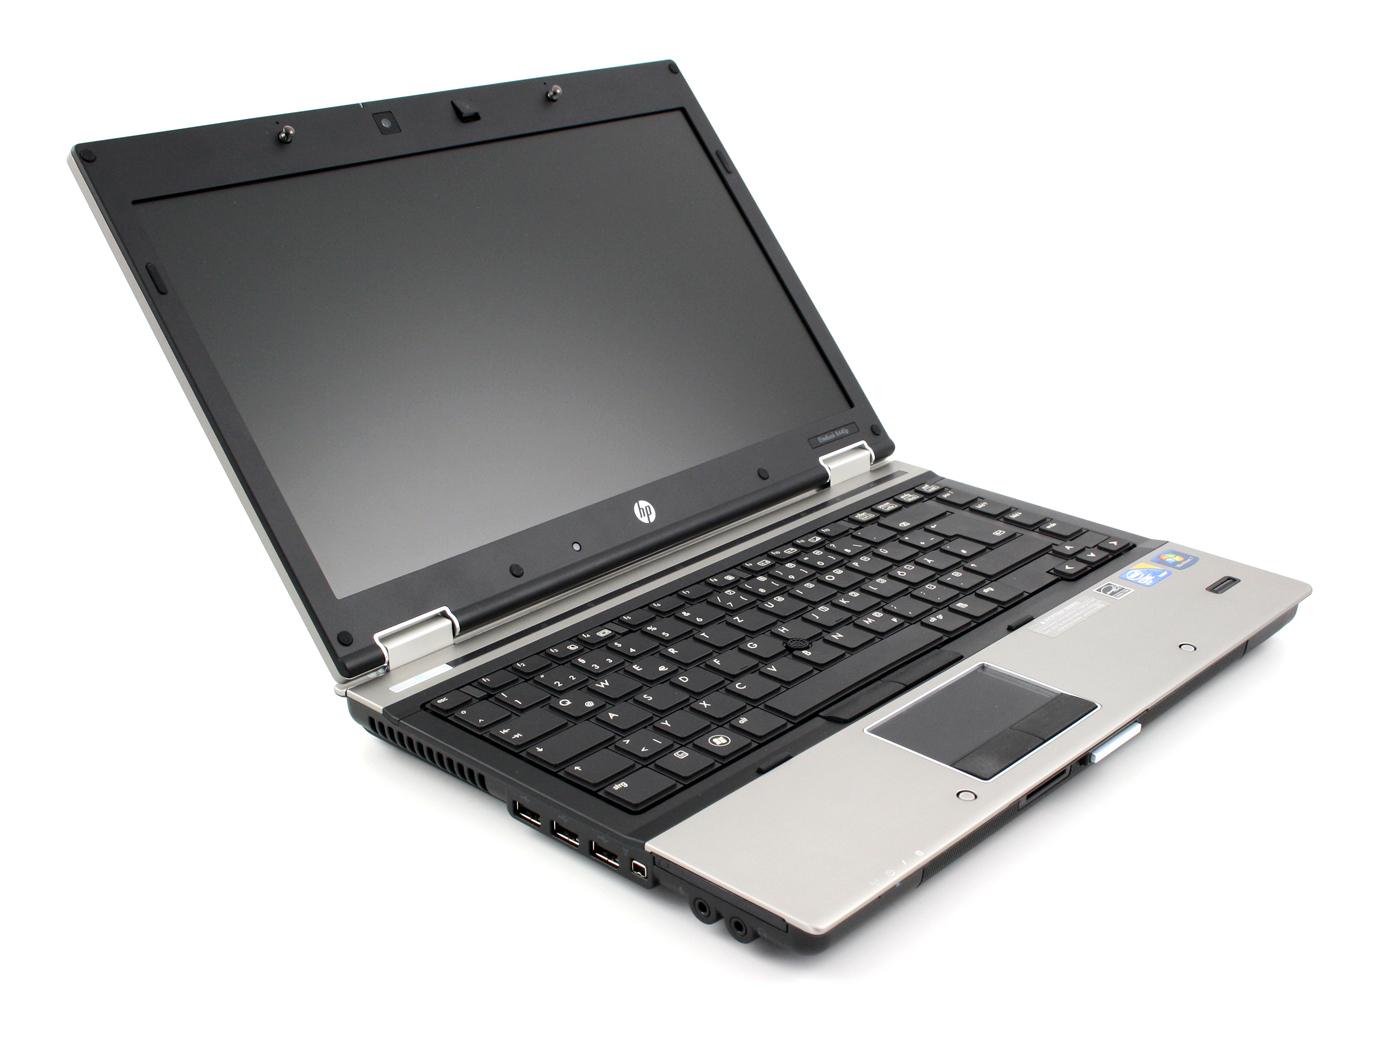 HP EliteBook 8440p schematic diagram |